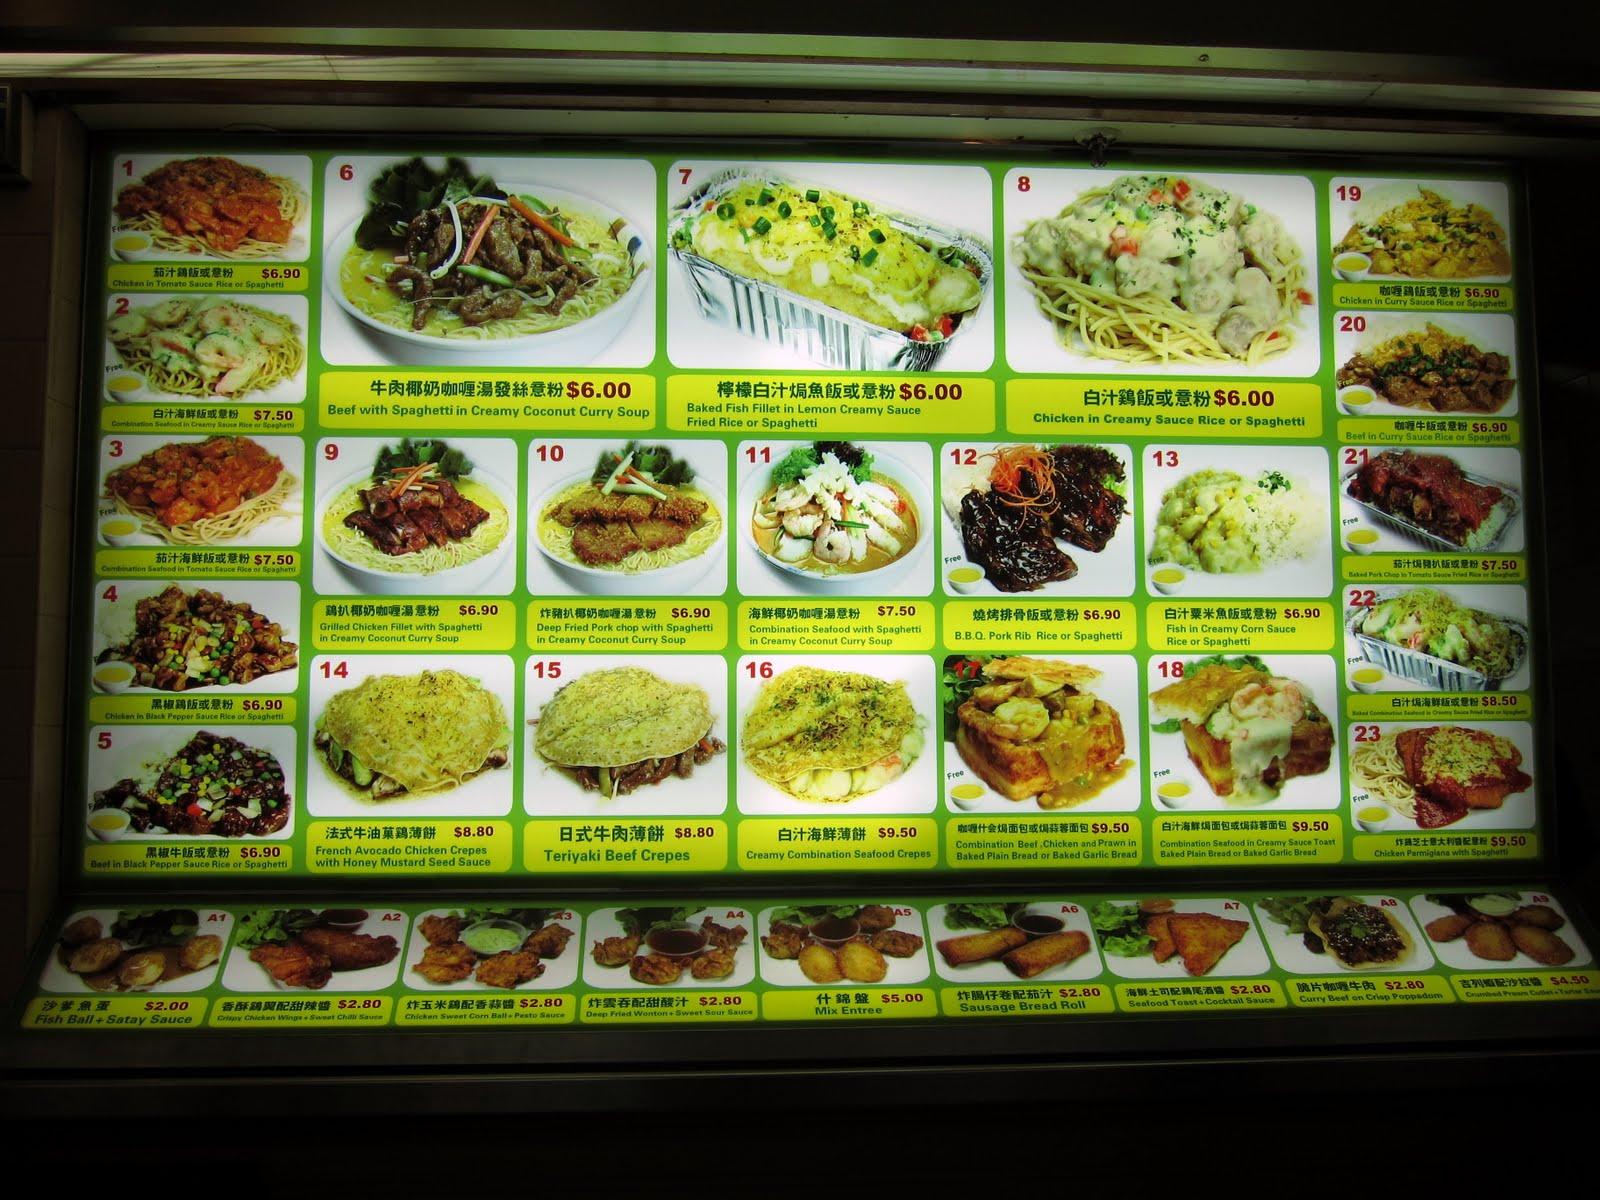 B kyu alex kitchen hong kong cafe chinese western food dixon alex kitchen menu click to enlarge forumfinder Choice Image